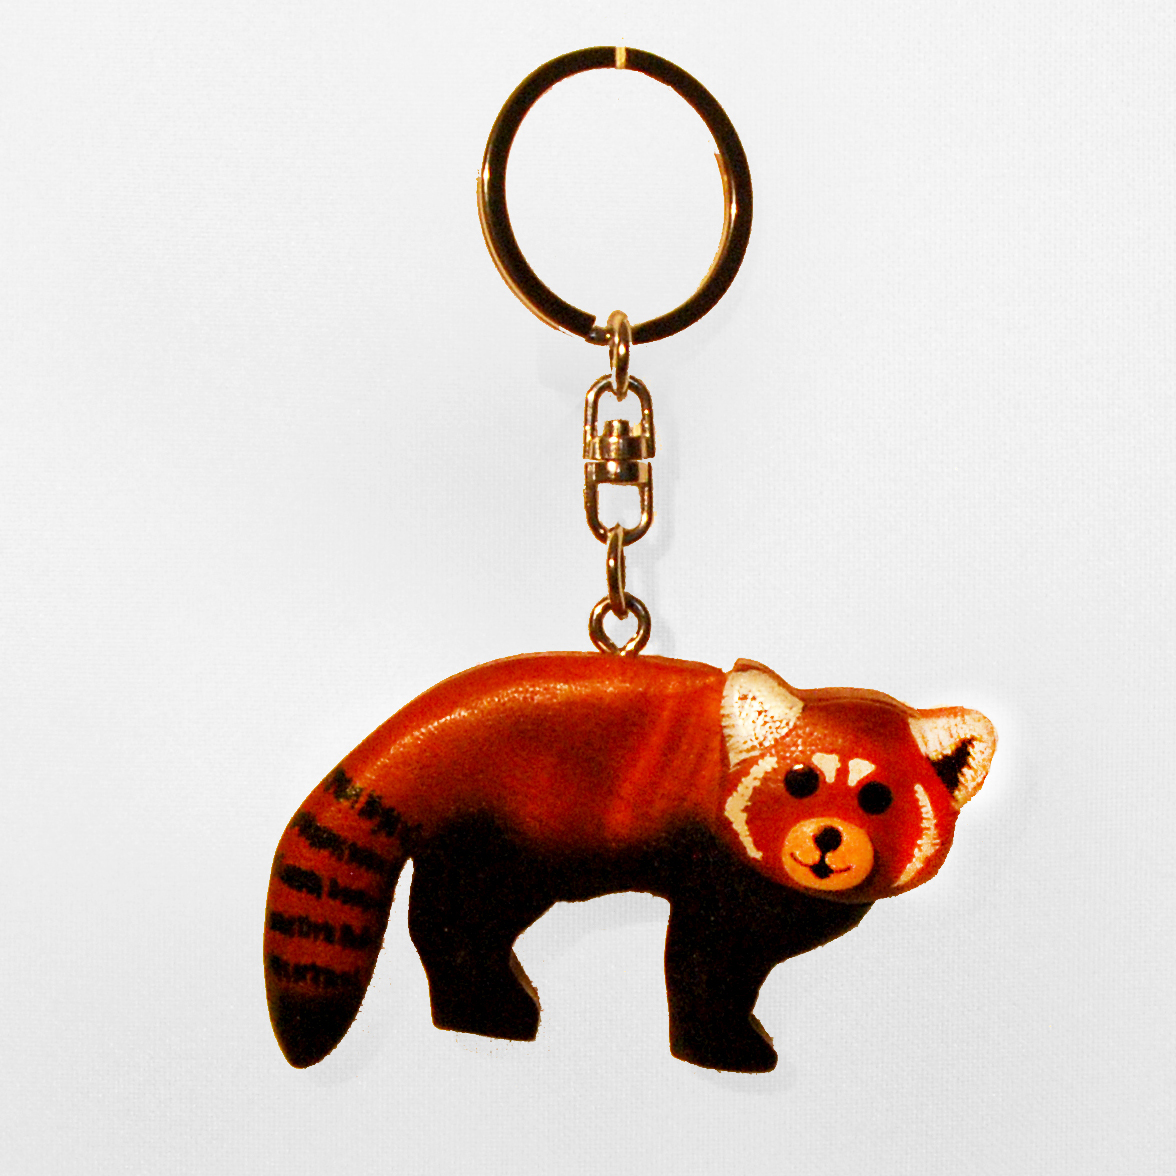 Schlüsselanhänger Roter Panda